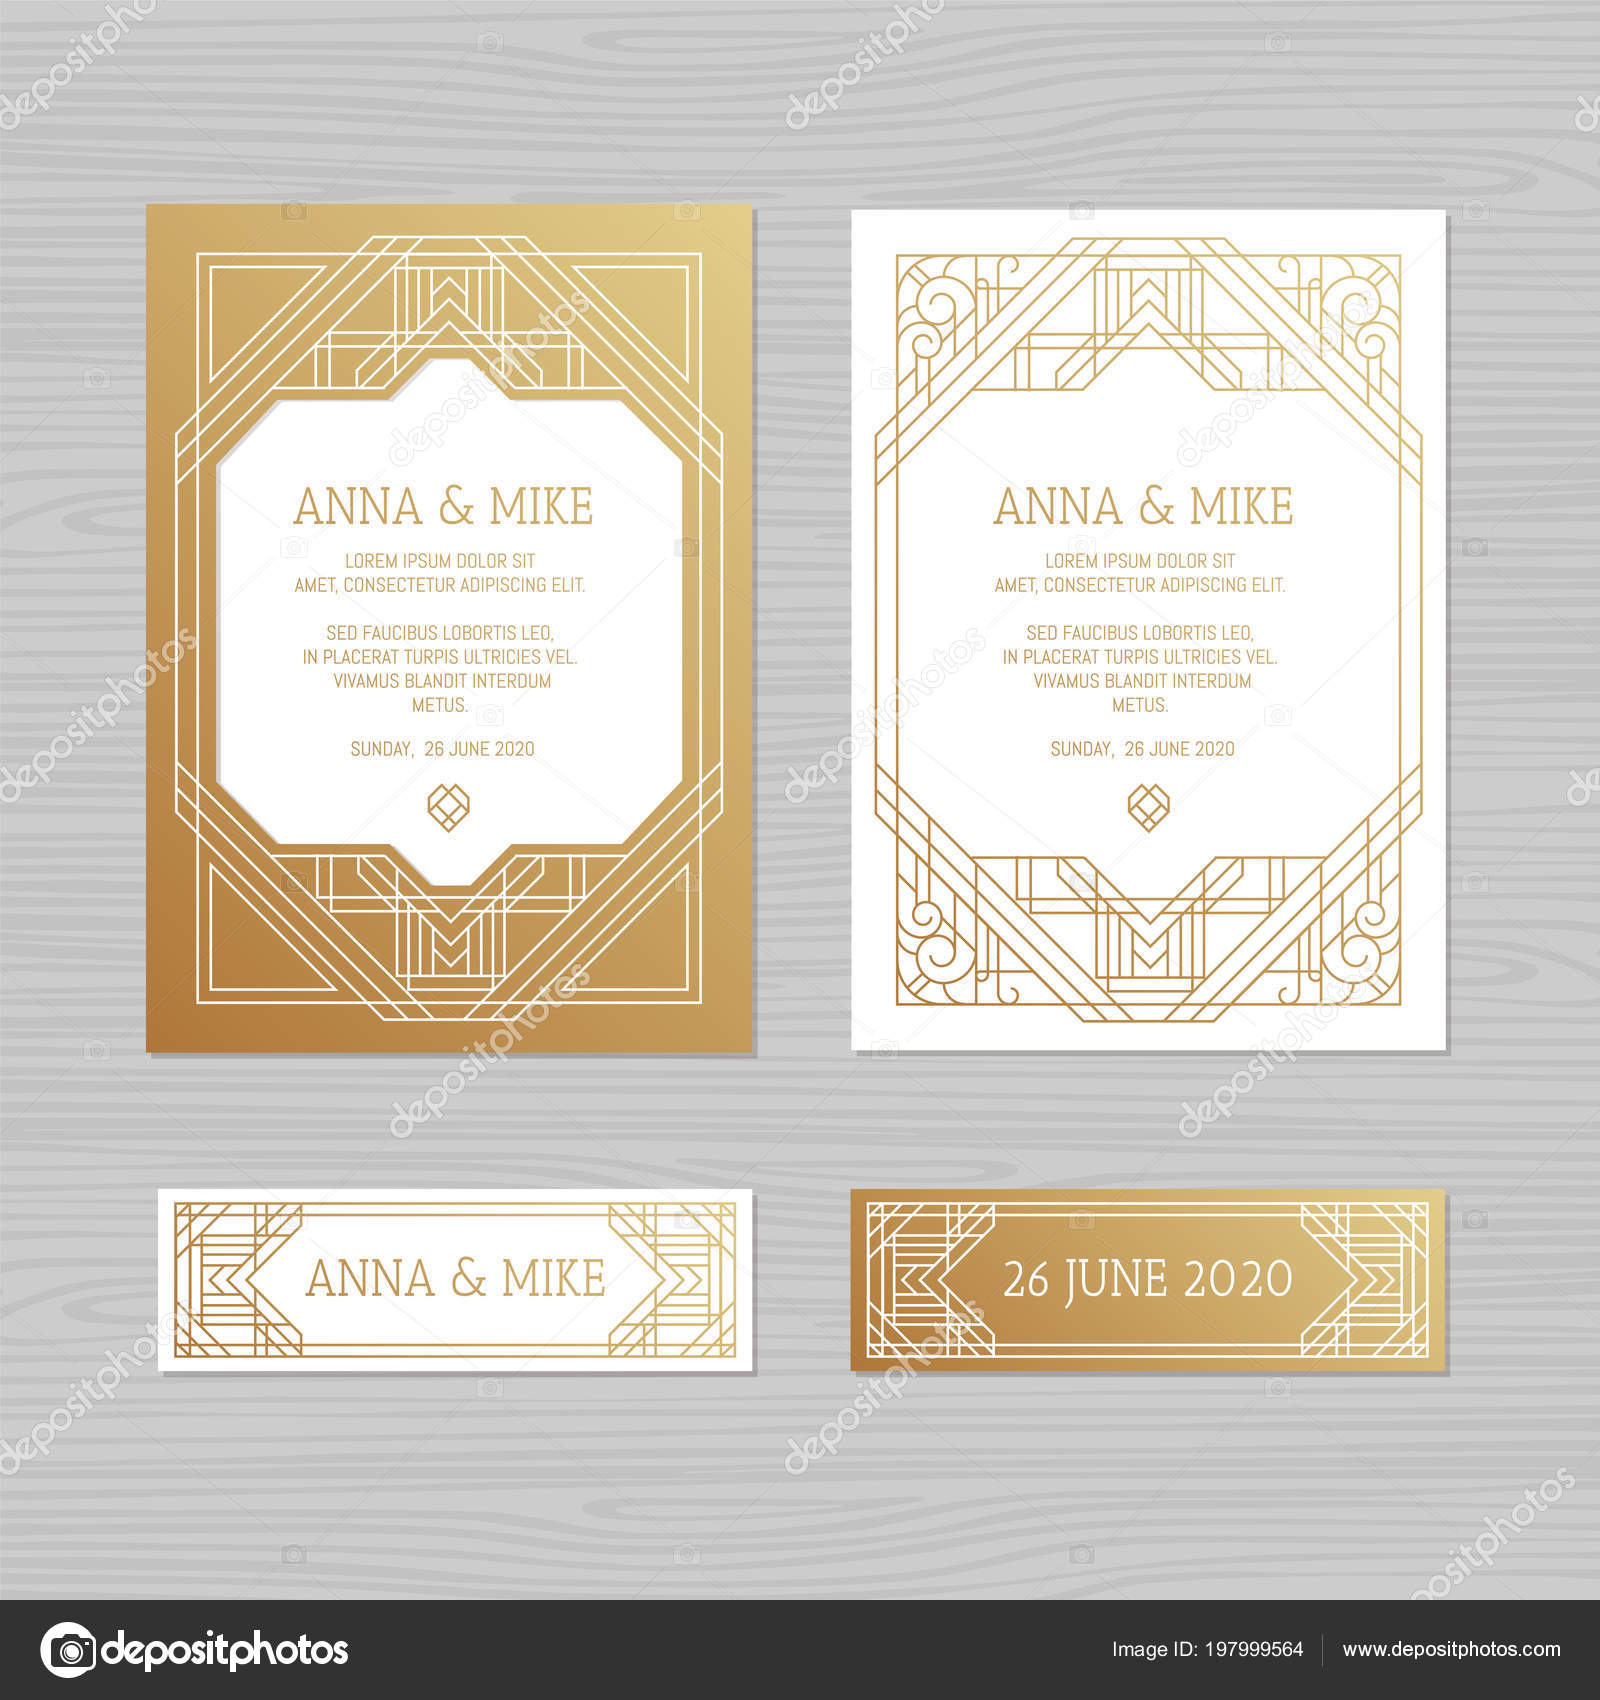 Cartoline Auguri Matrimonio : Pz laser cut matrimonio mr mrs inviti di nozze carte di auguri